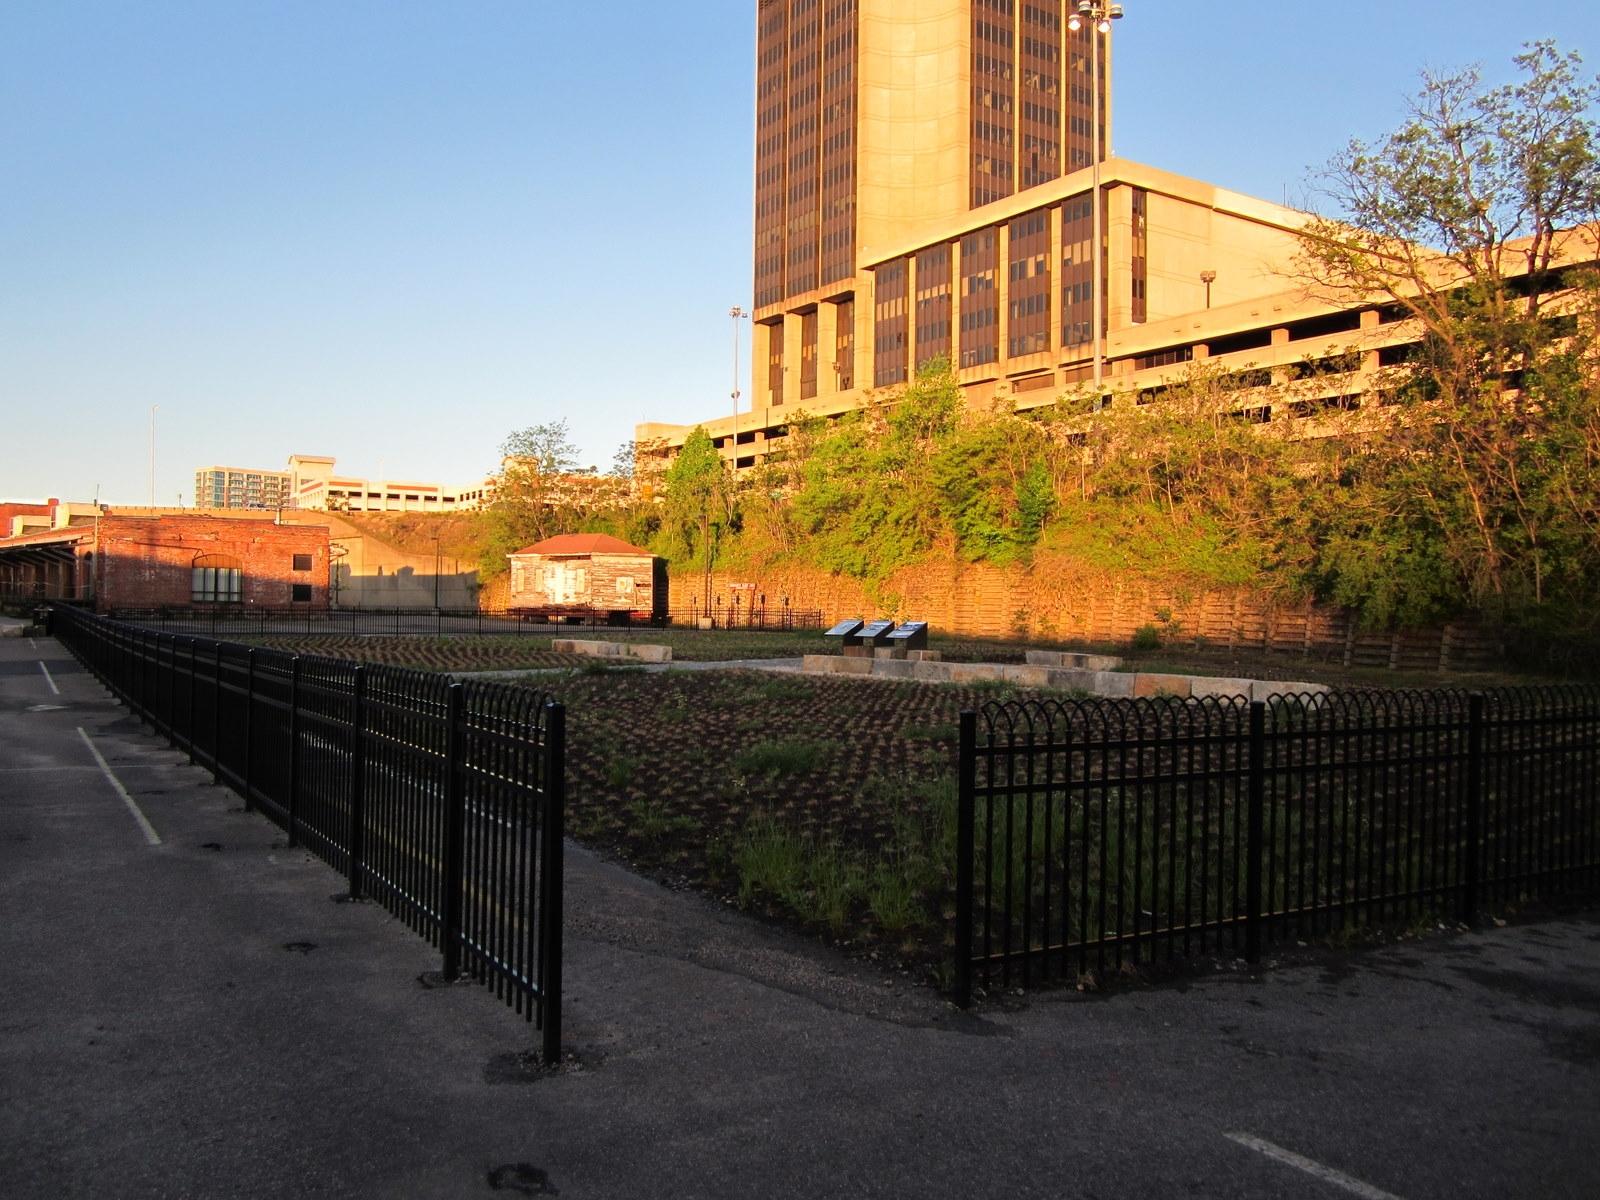 Lumpkin's Jail Site